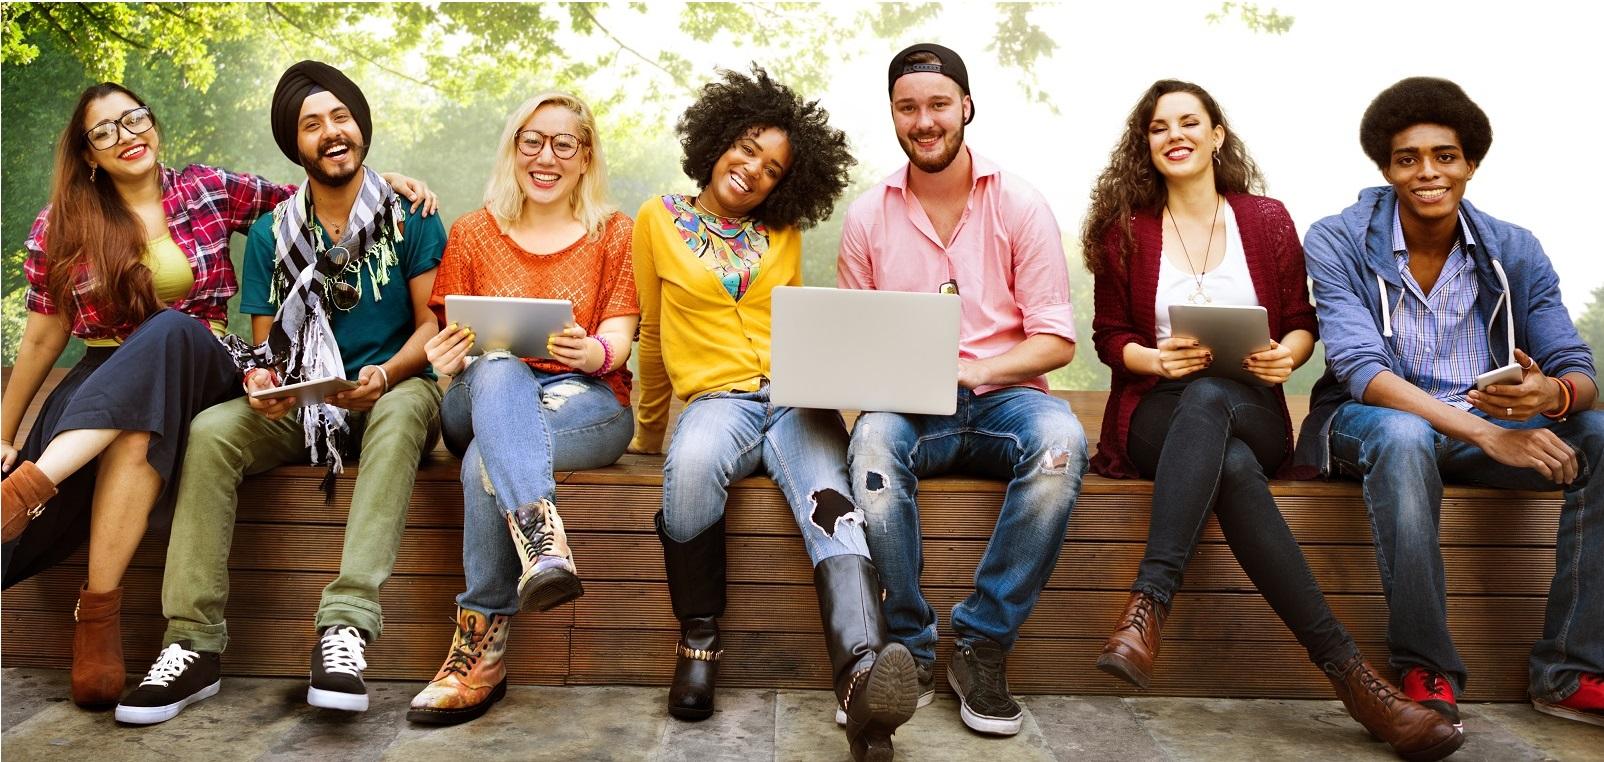 several students sitting together